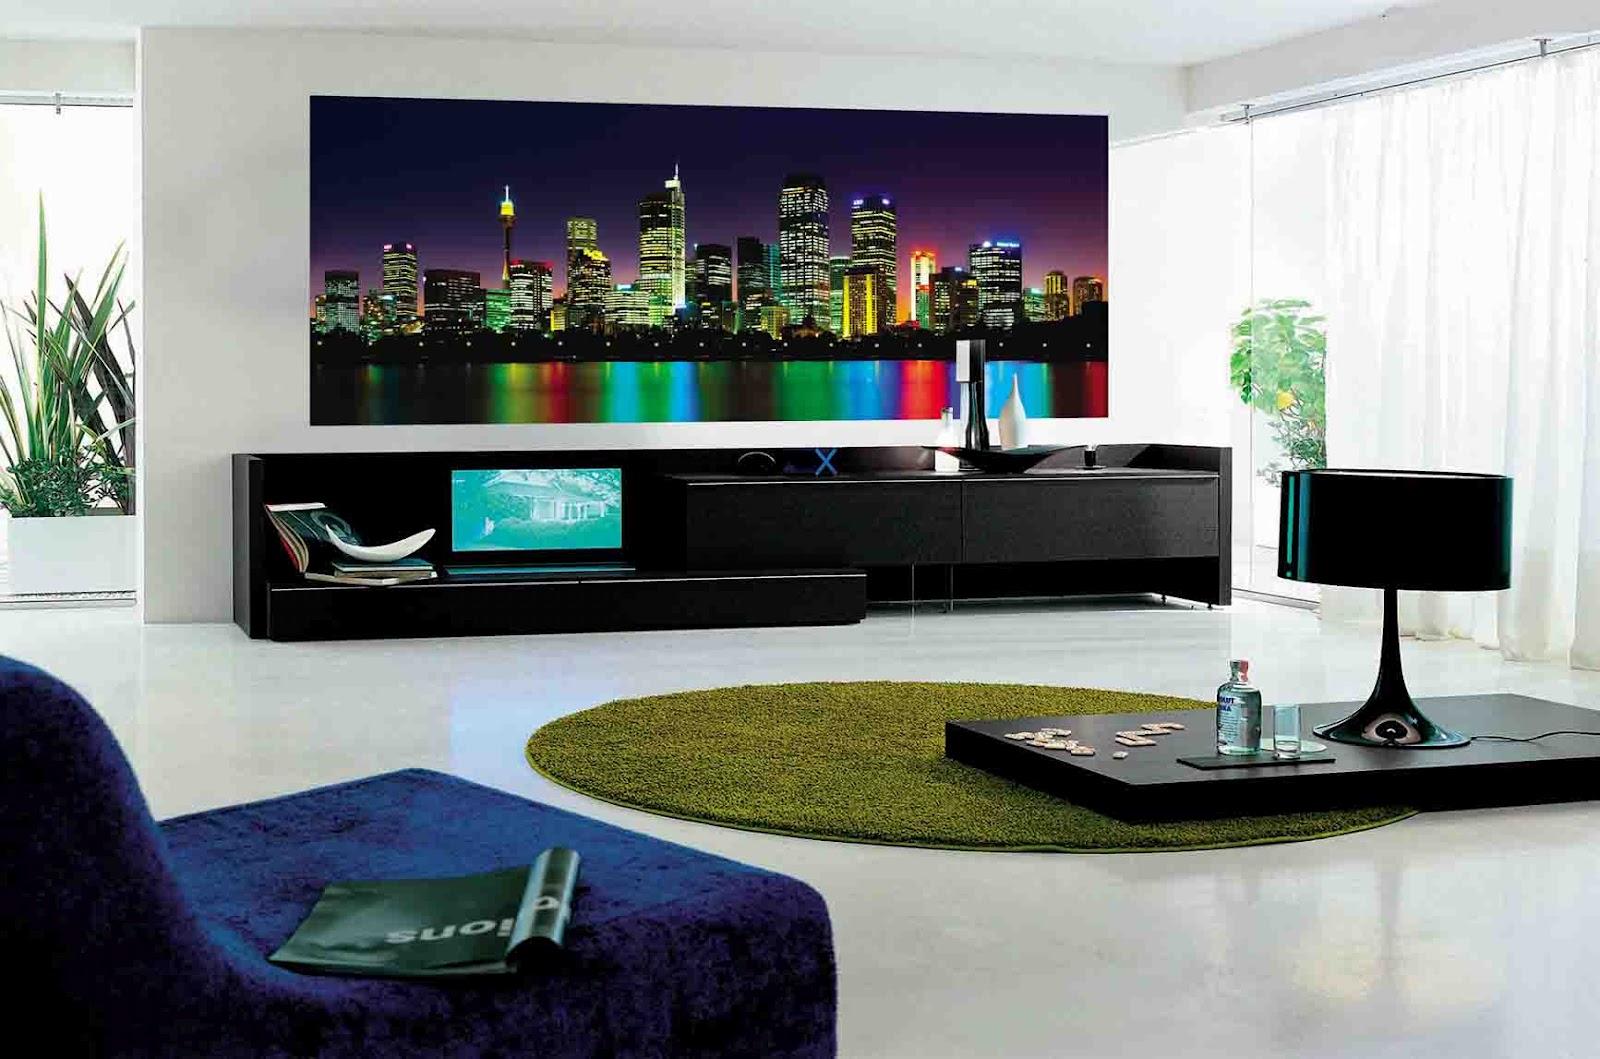 Decora o bonita para sala moderna ideias decora o for Casa stile minimalista